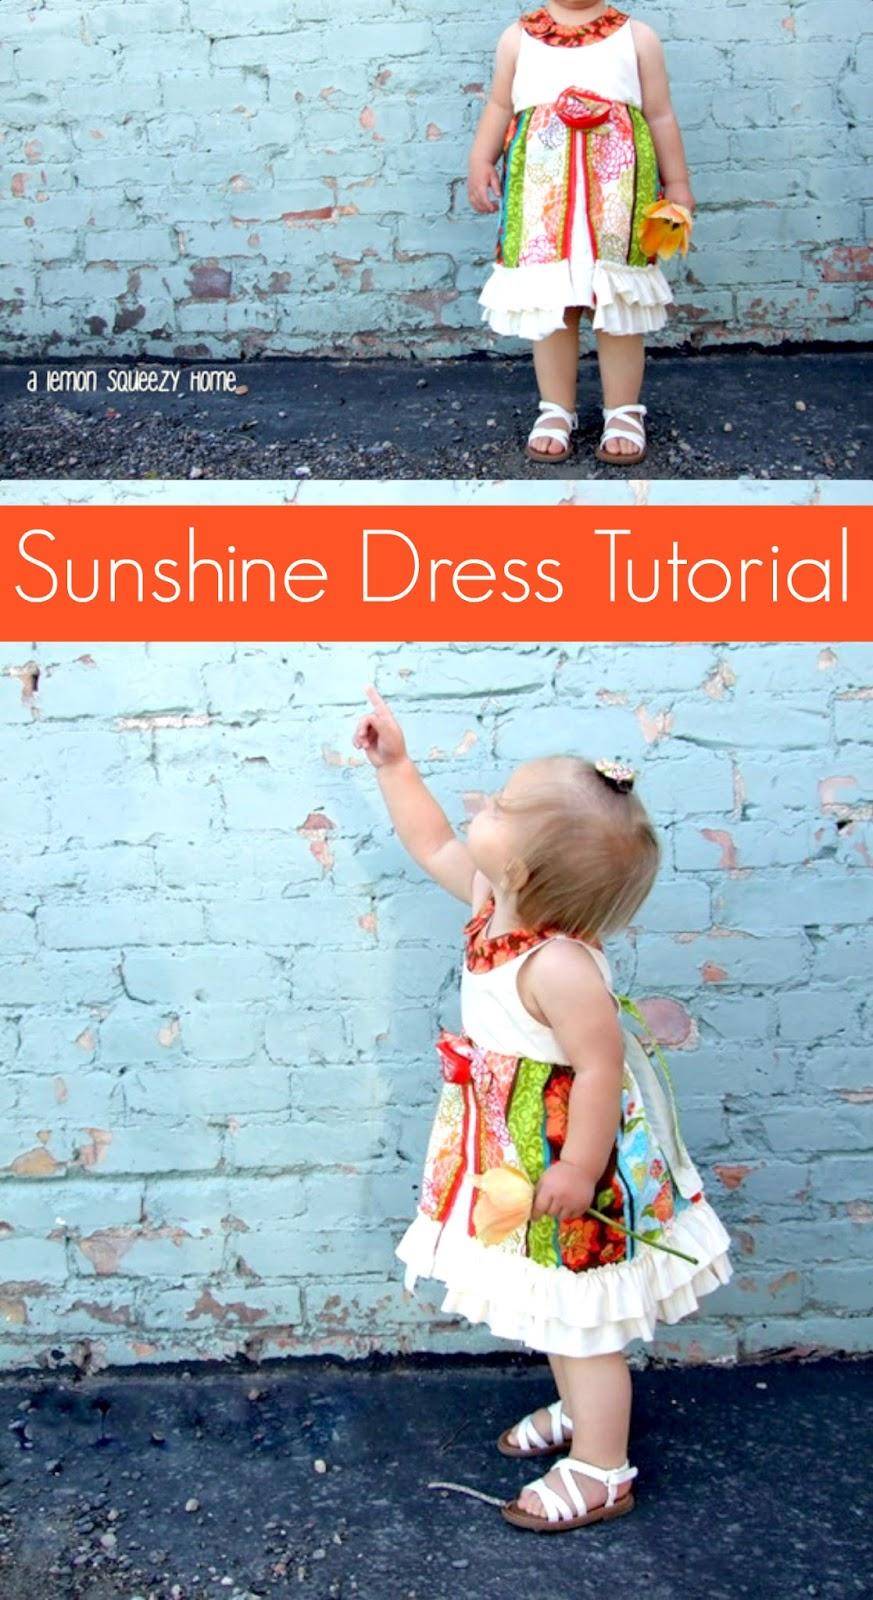 The Sunshine Dress Tutorial {lemon squeezy home}